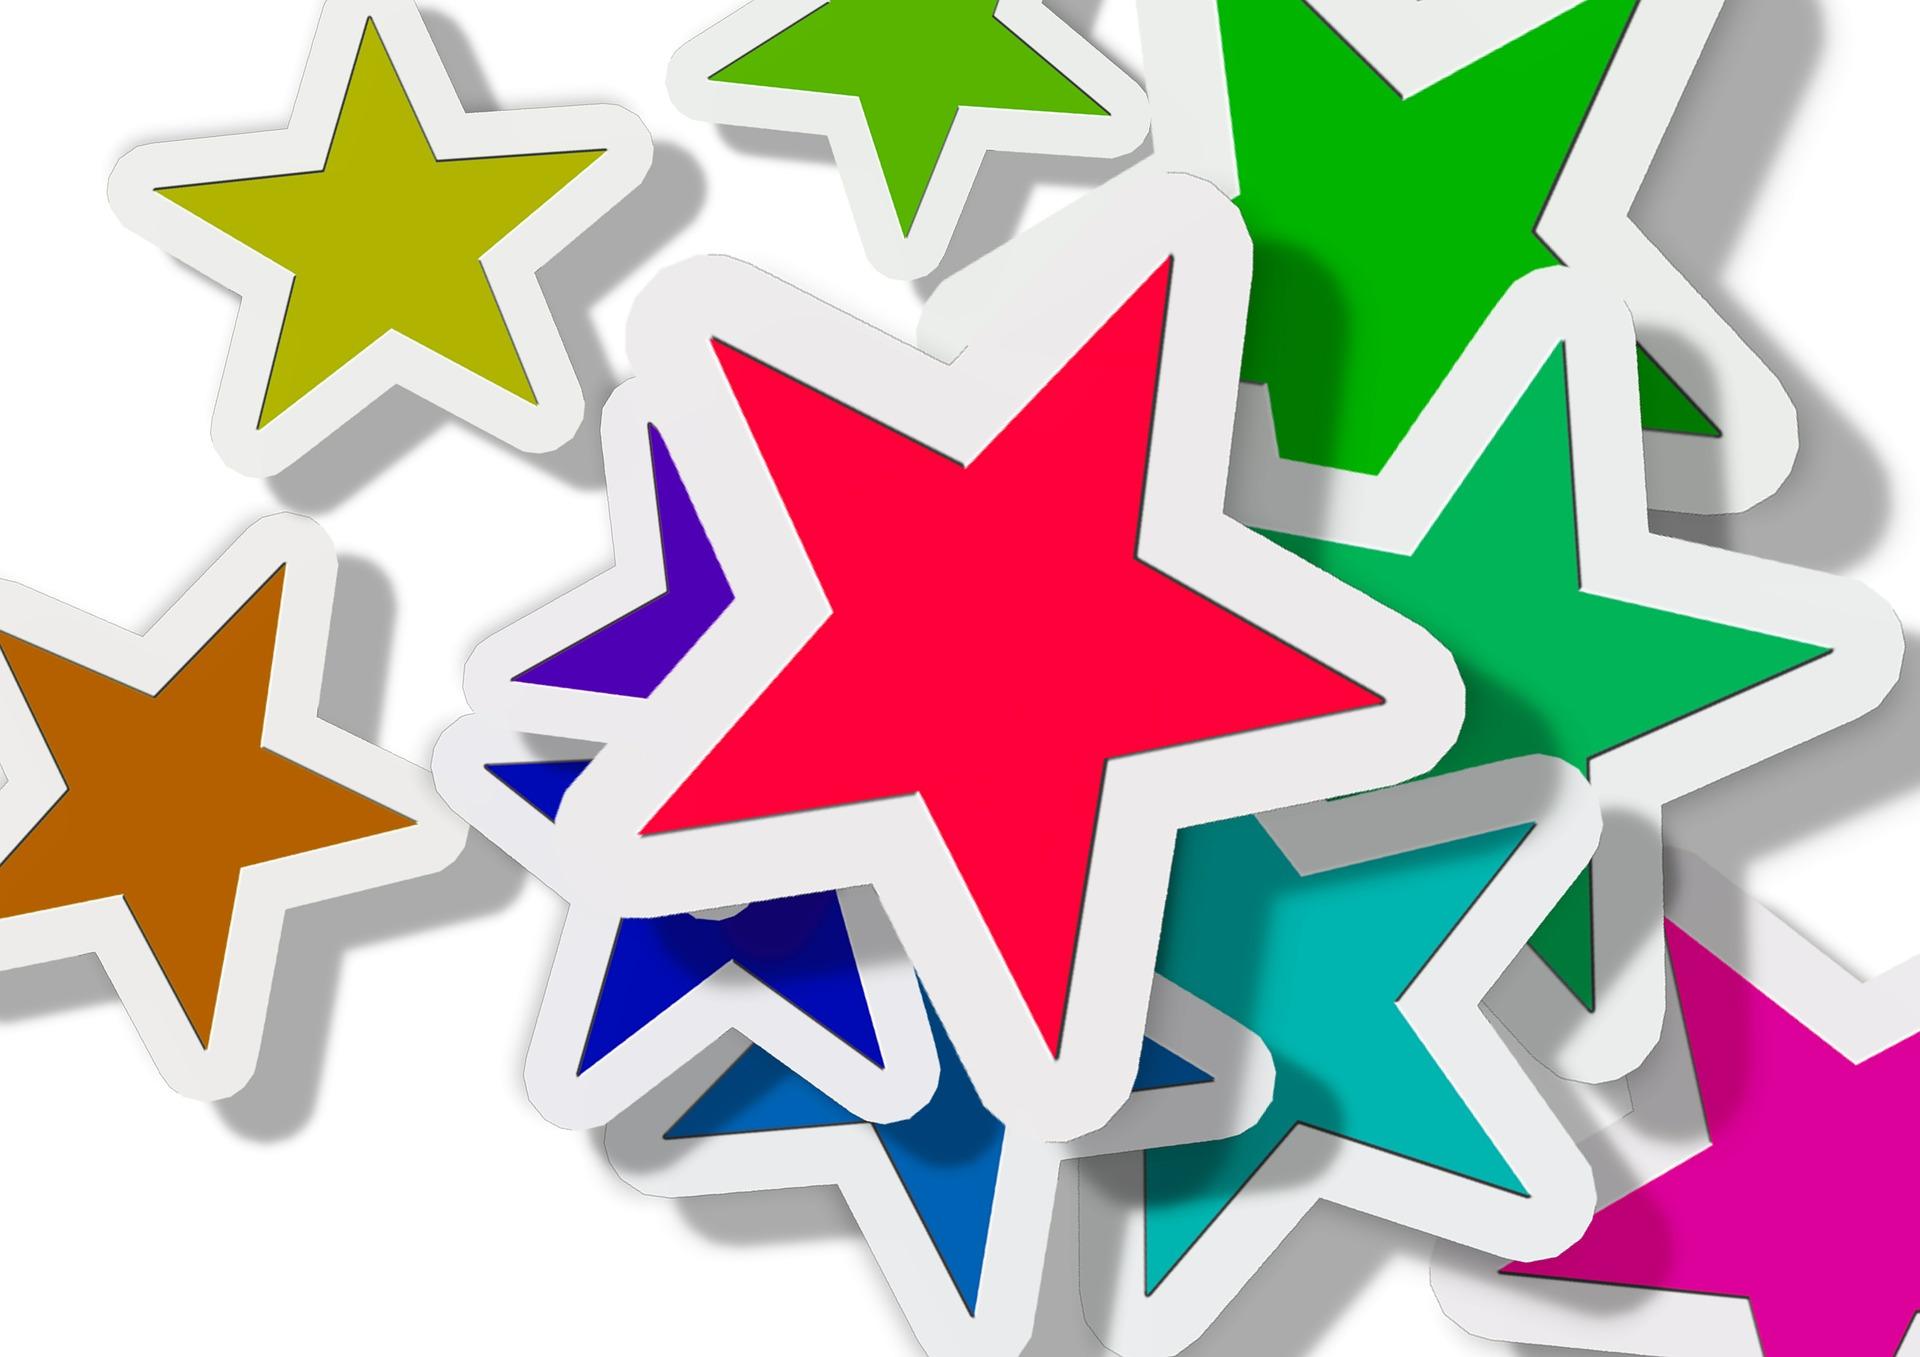 Star Reviews The Boardwalk